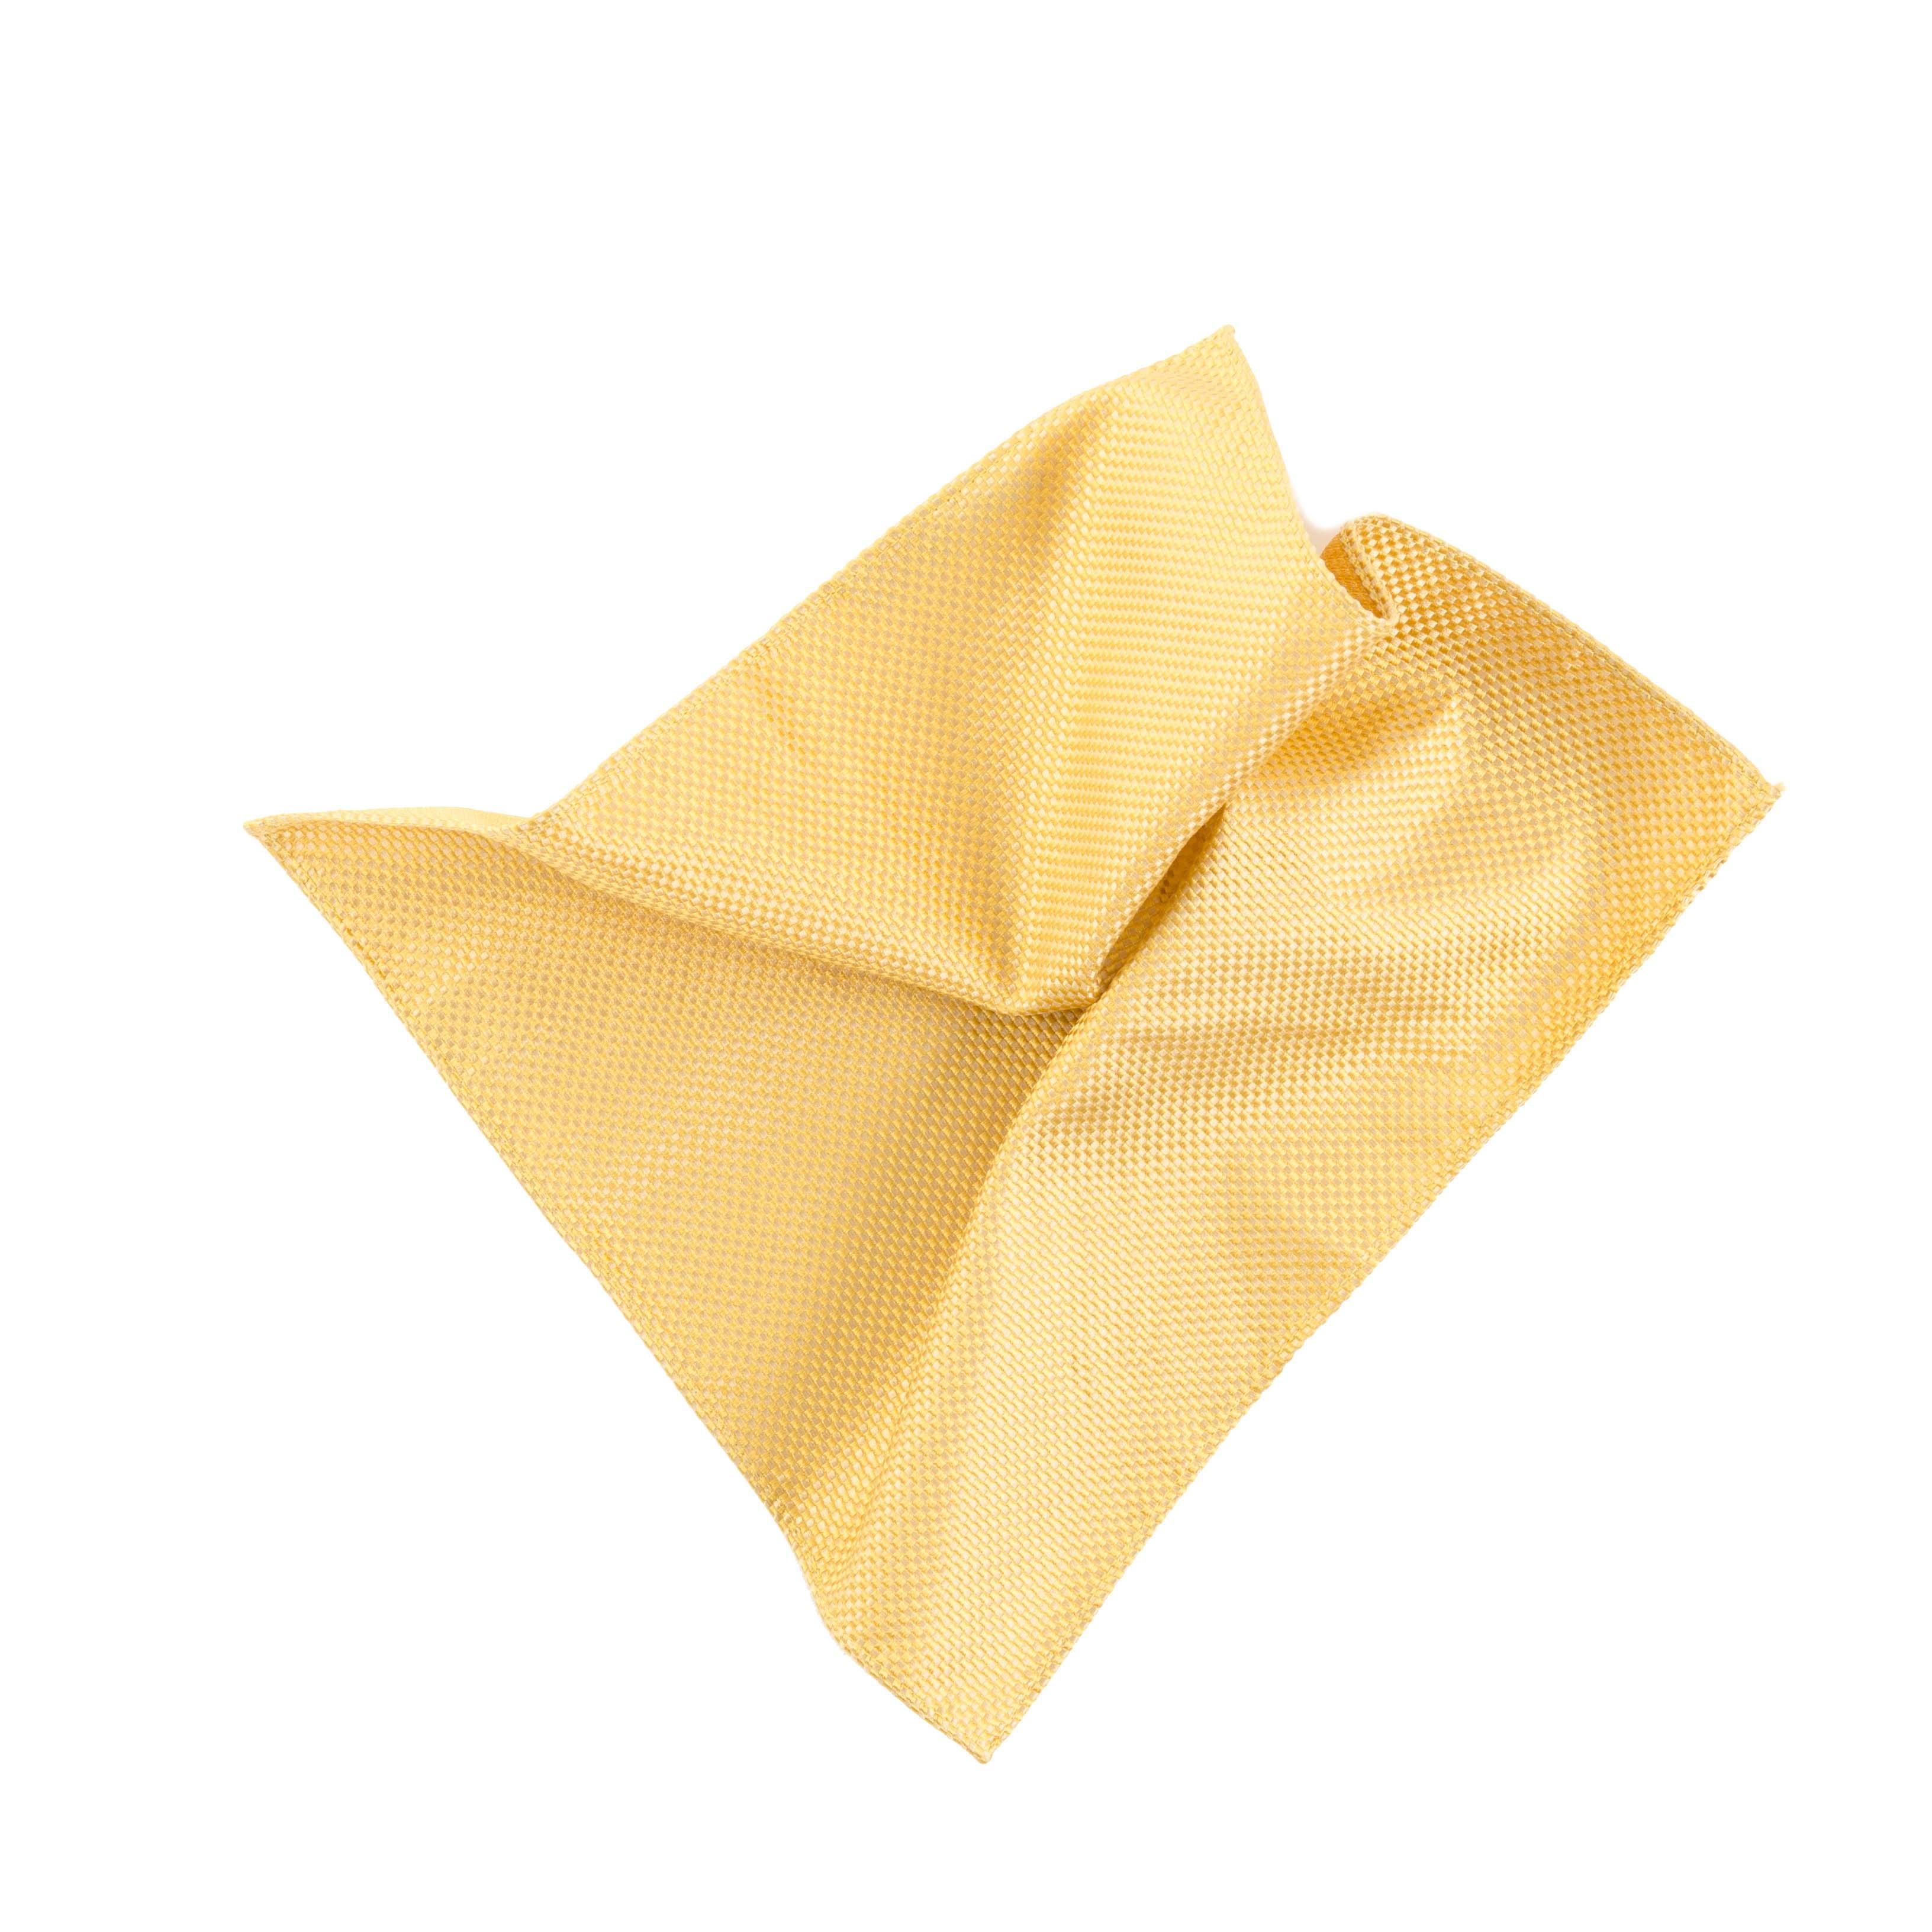 Pocket square yellow panama made of silk